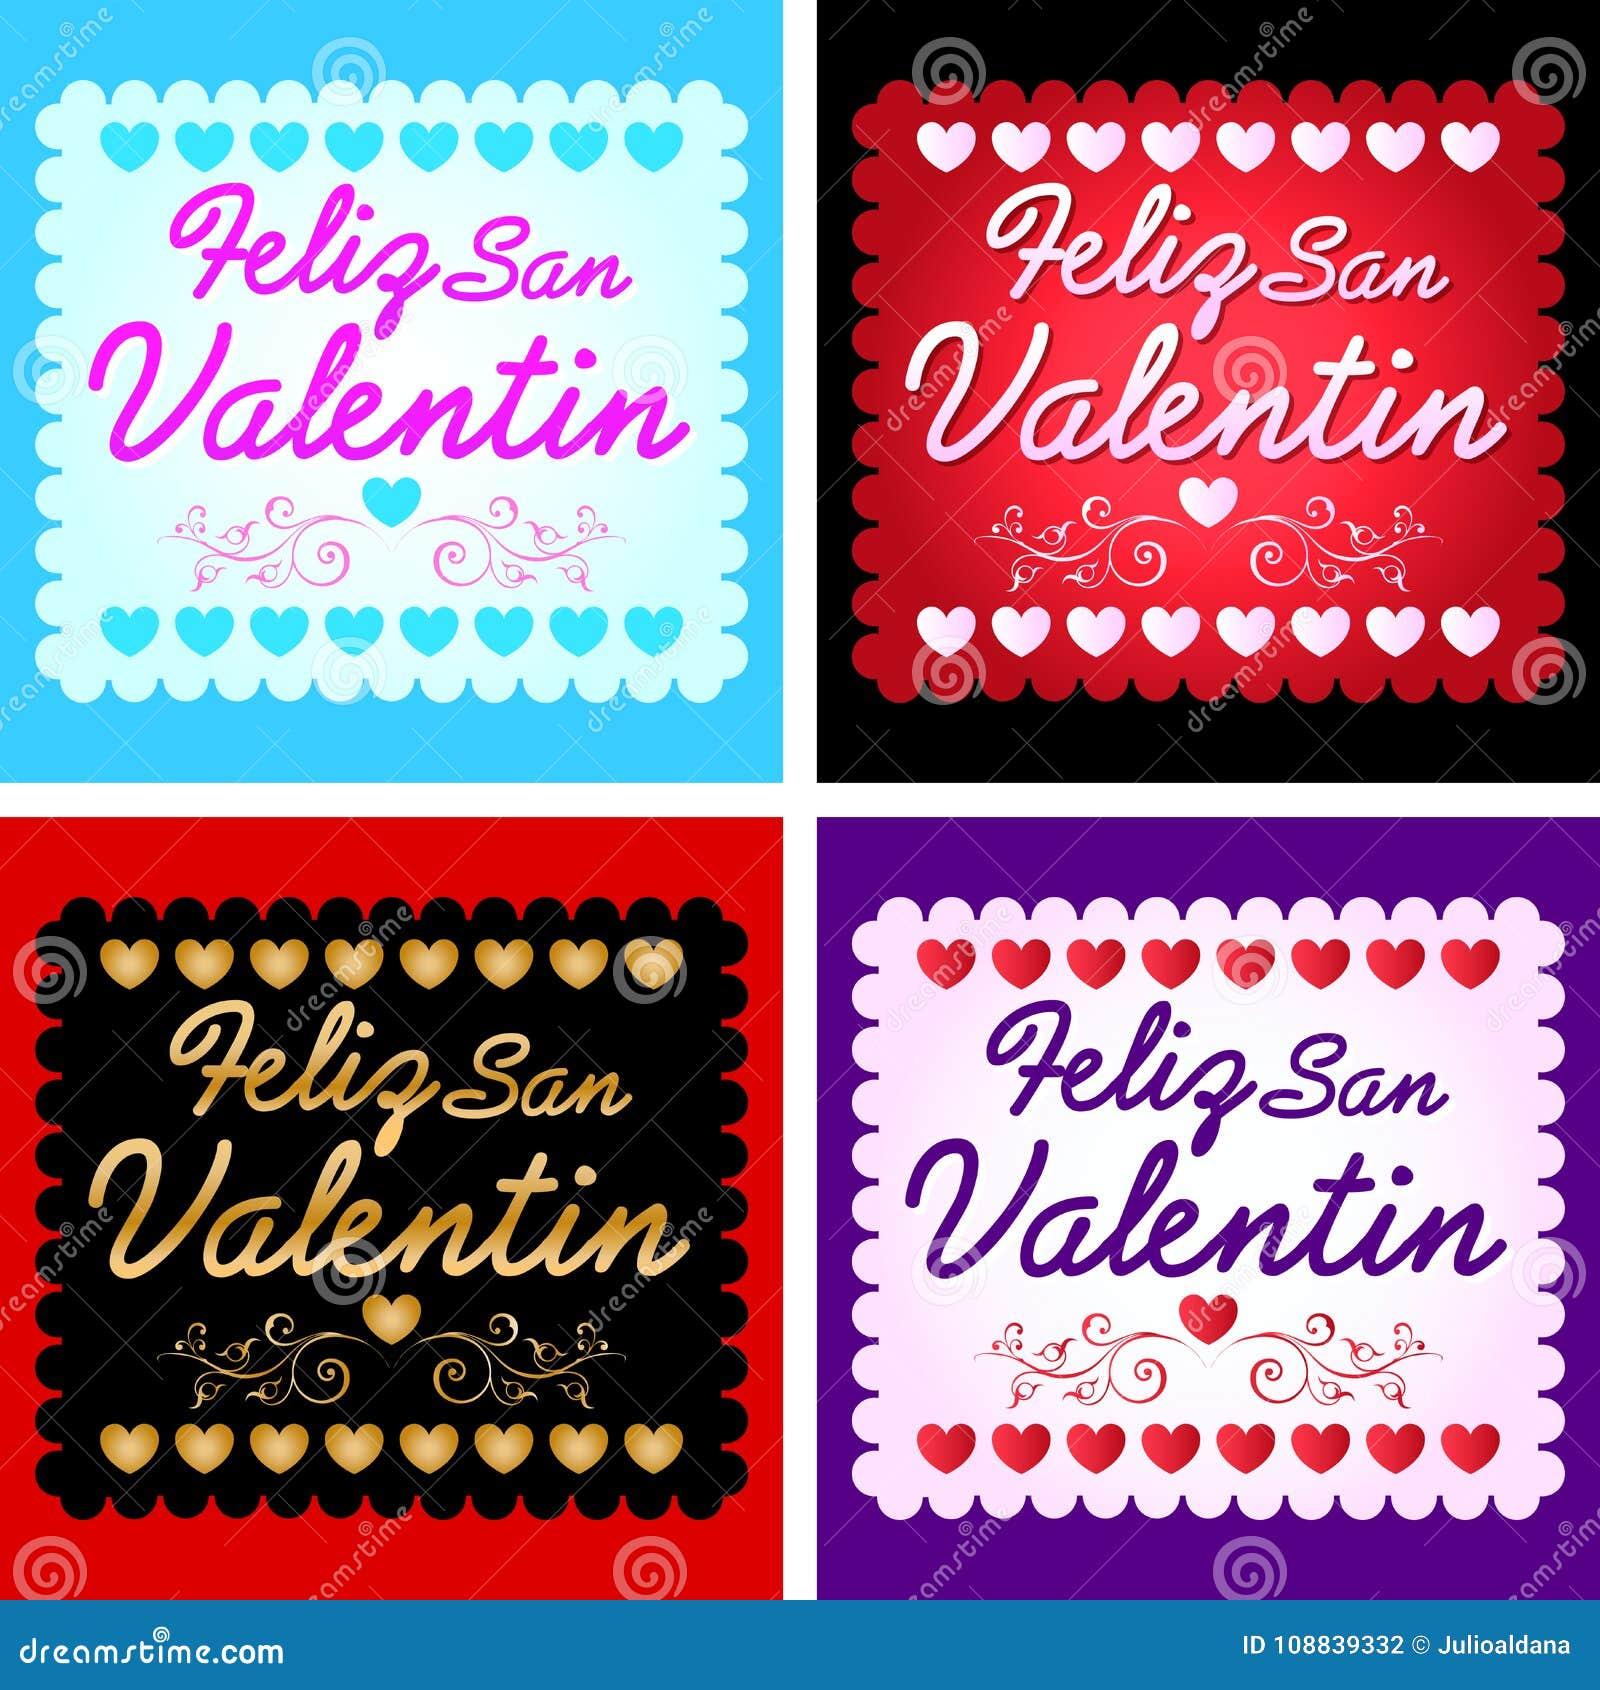 Feliz San Valentin Happy Valentines Day In Spanish Language Stock